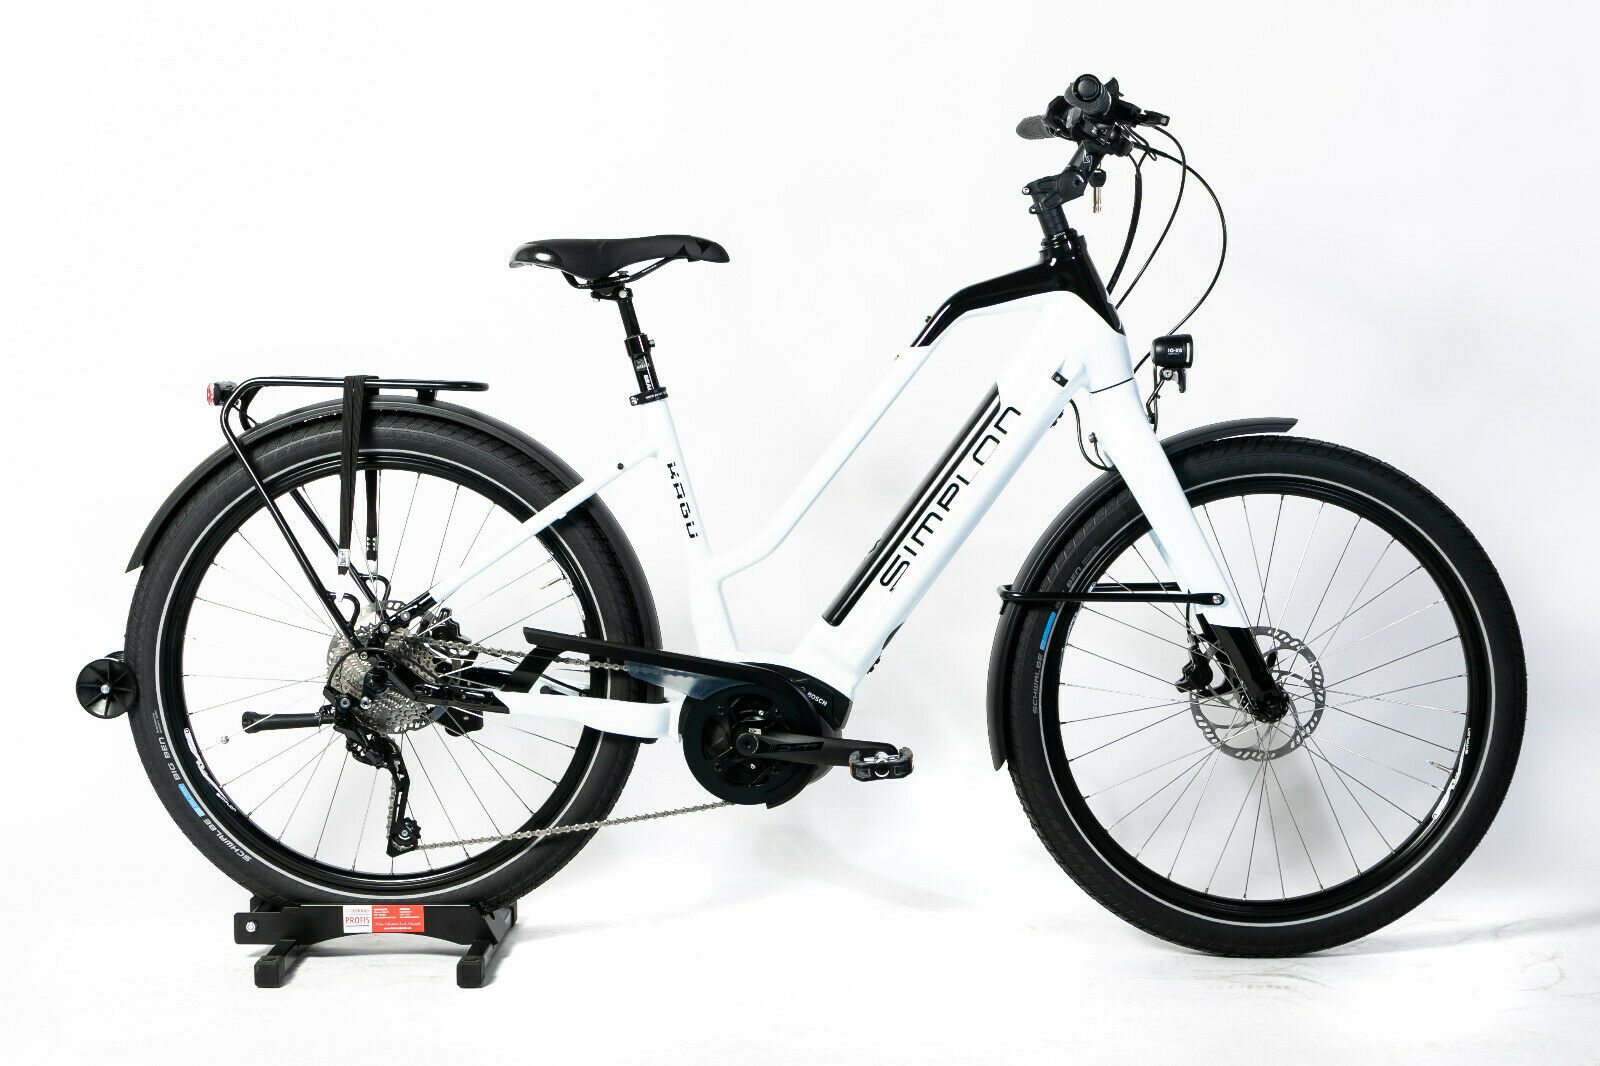 26 Zoll E-Bike Simplon Kagu Trapez Unisex weiß Bosch 500Wh Modell 2020 UVP 3599